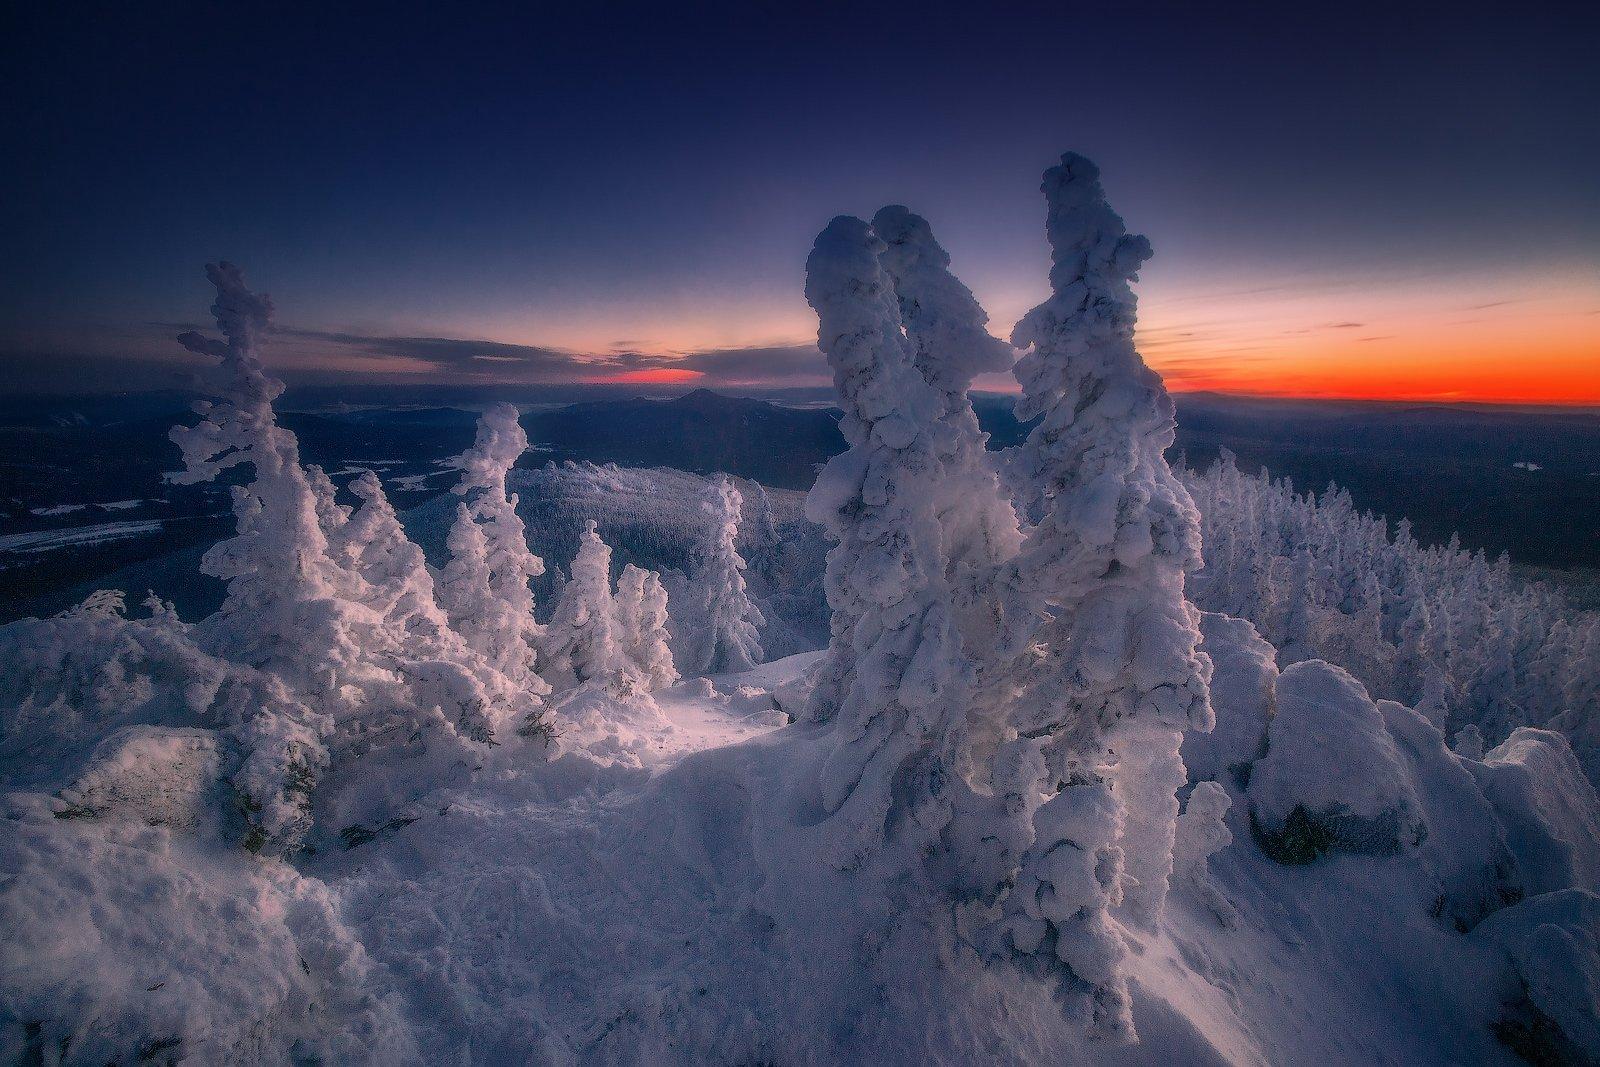 ялангас, урал, горы, зима, Владимир Ляпин